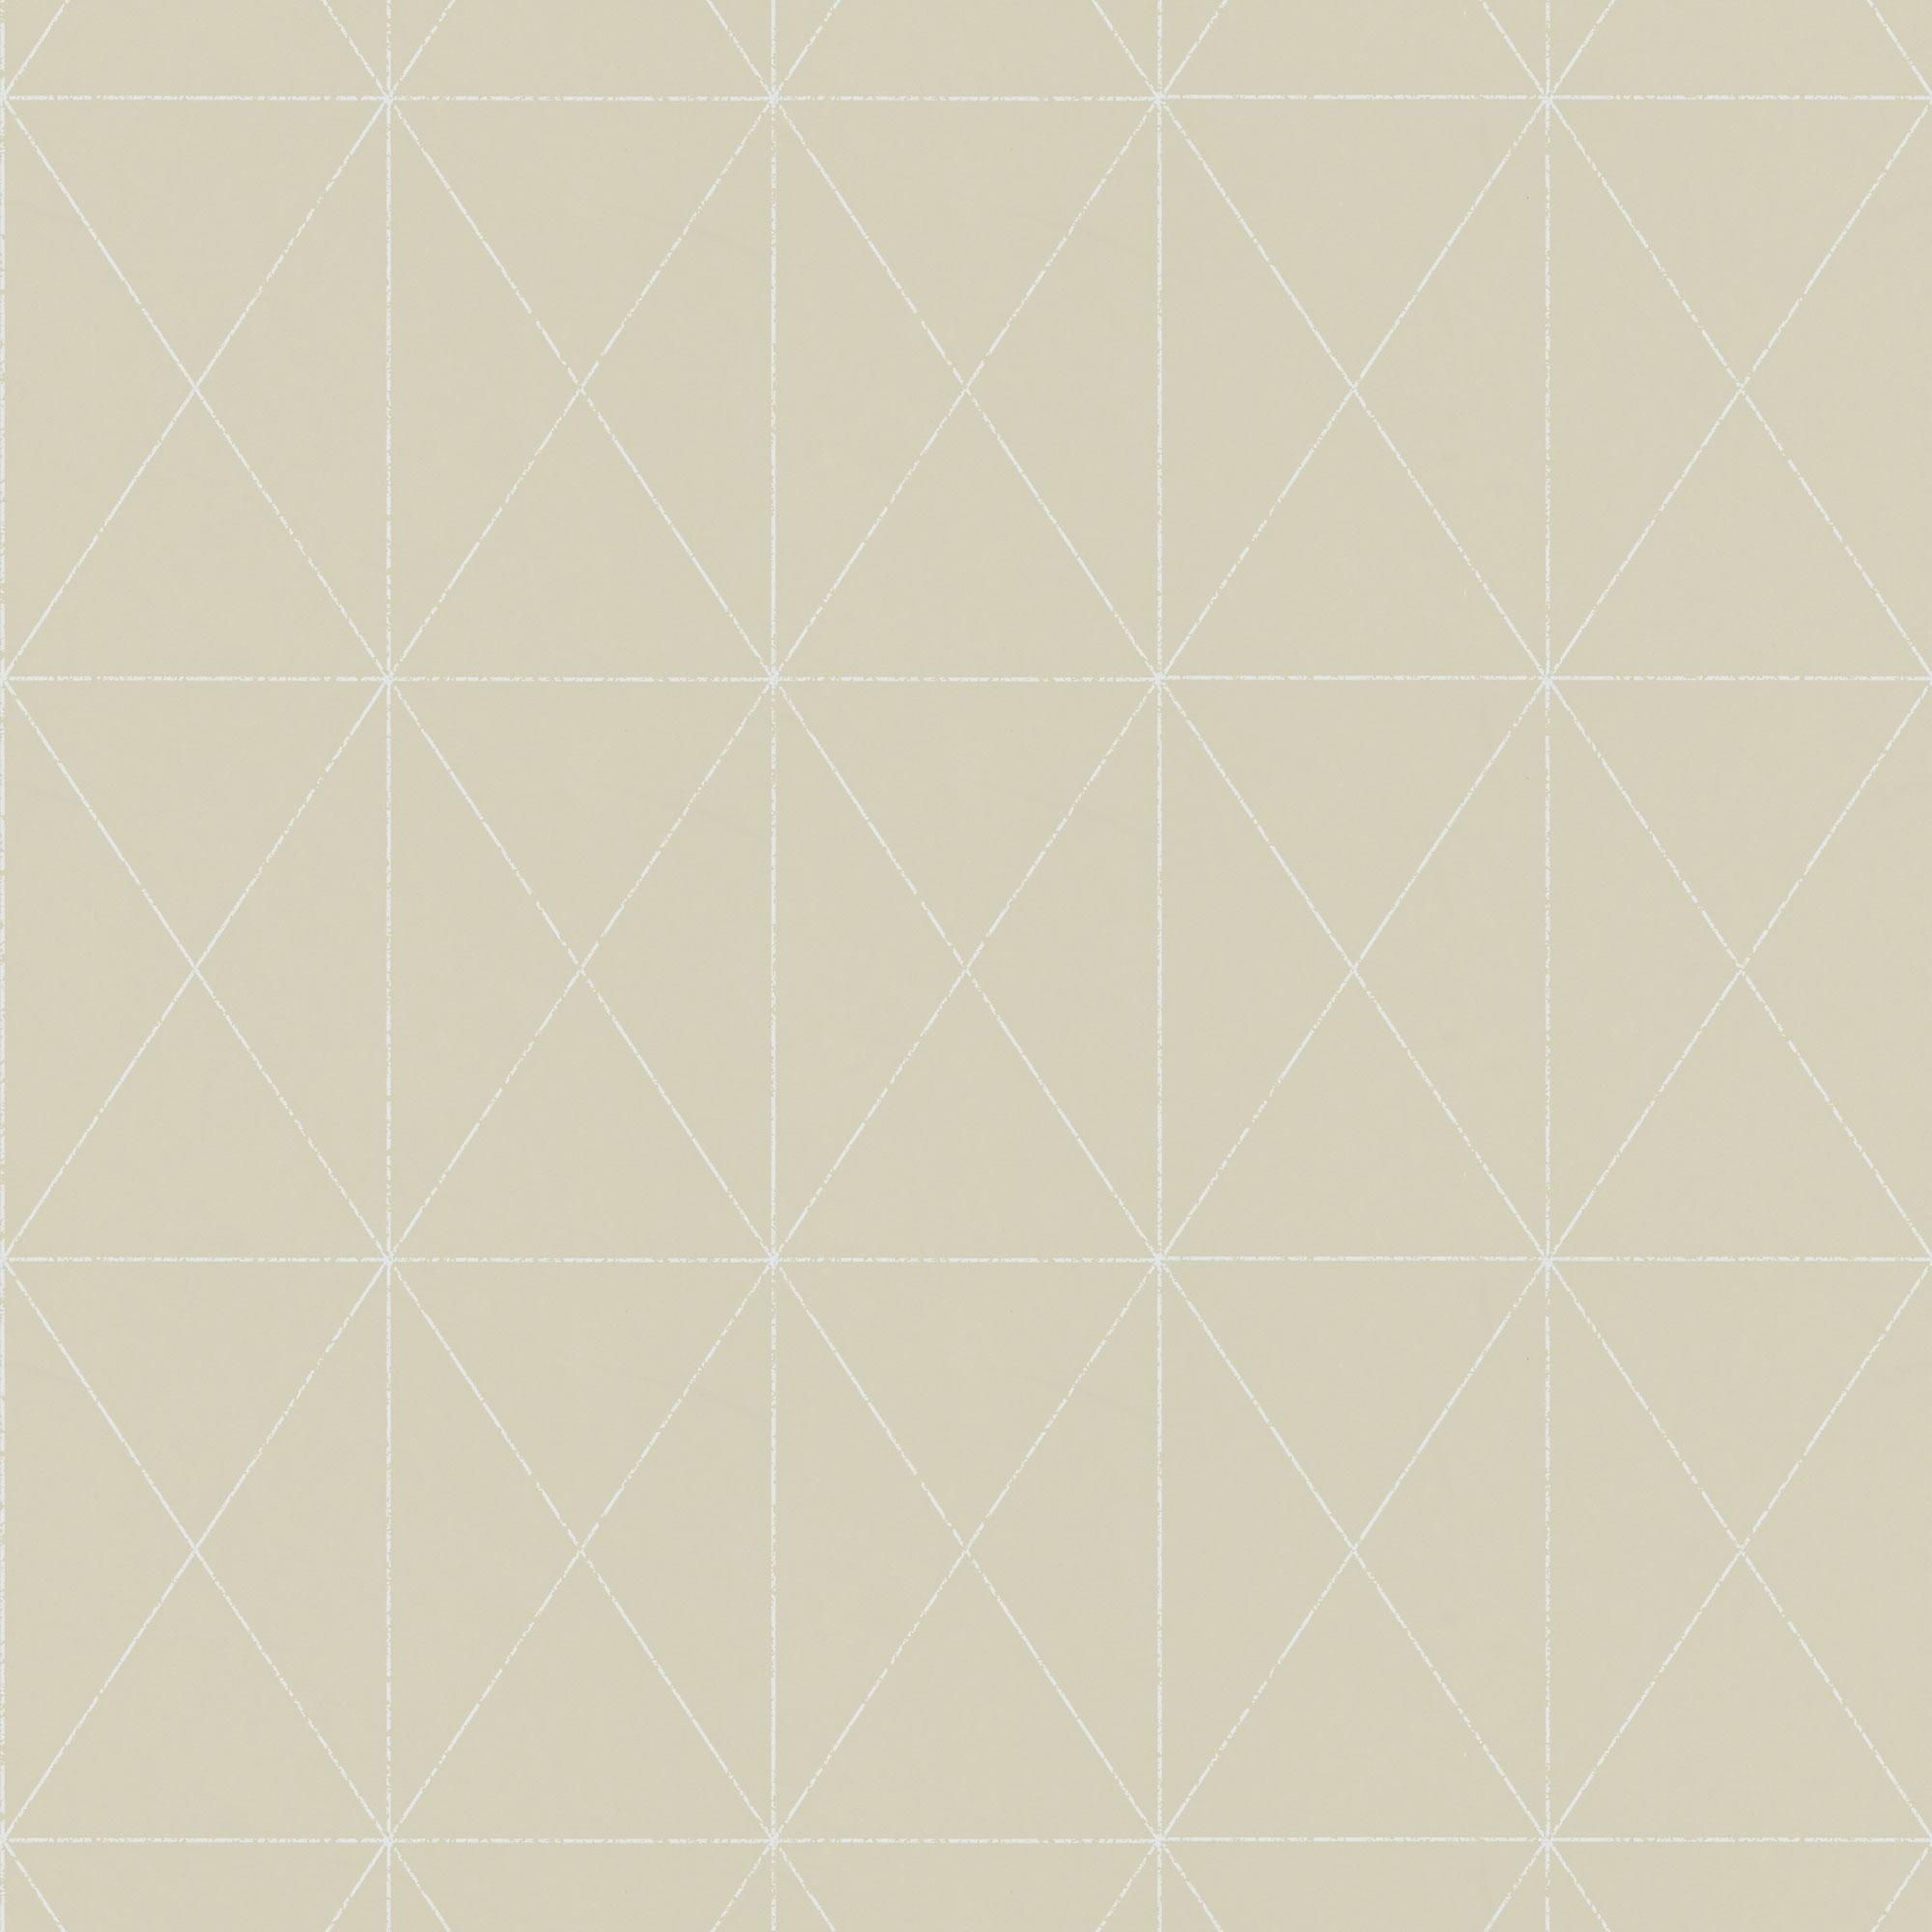 Шведские обои Sandberg,  коллекция Grace, артикул577-19